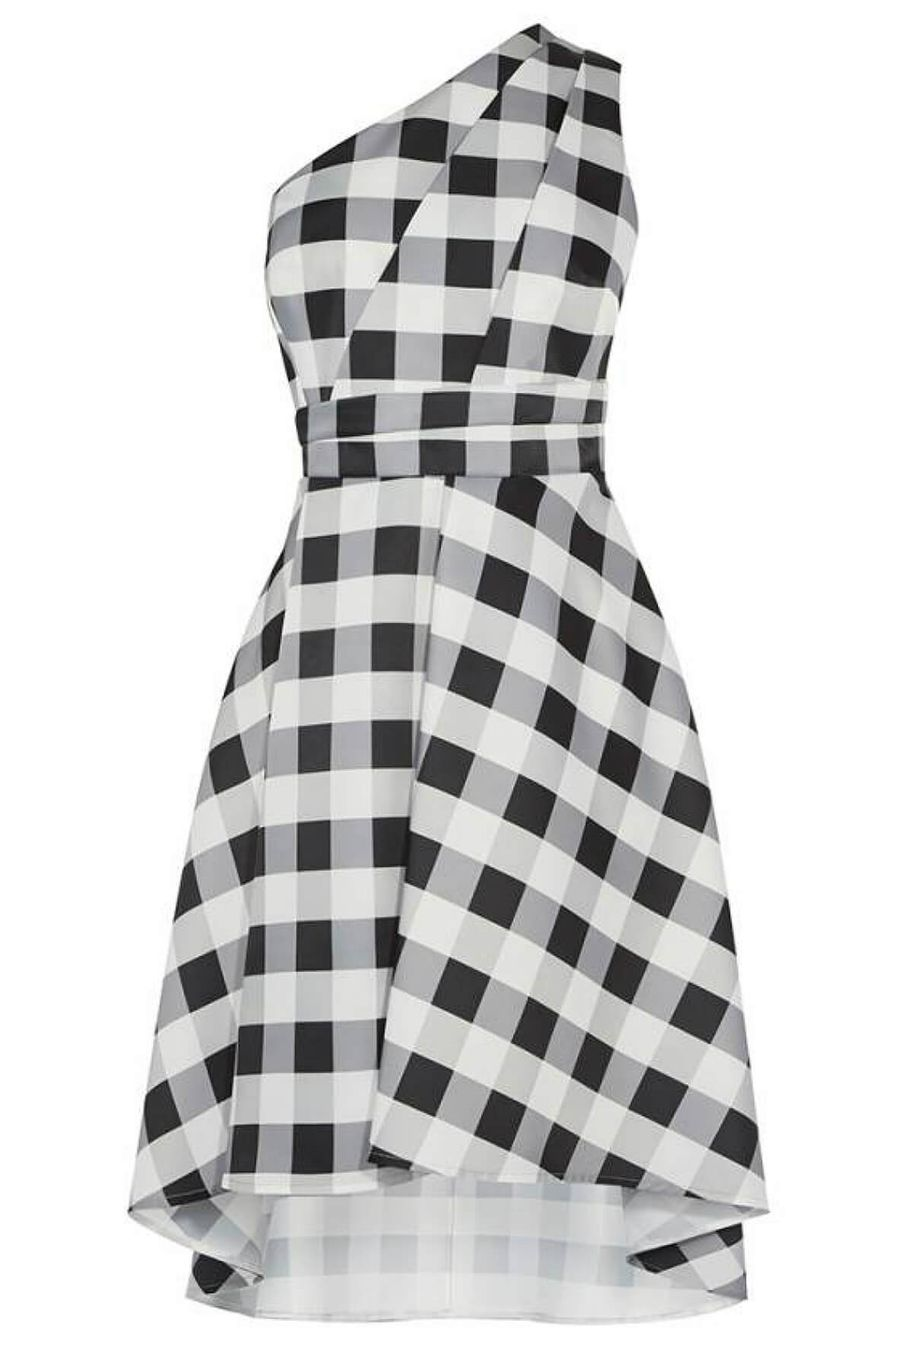 coast-nina-gingham-dress-1